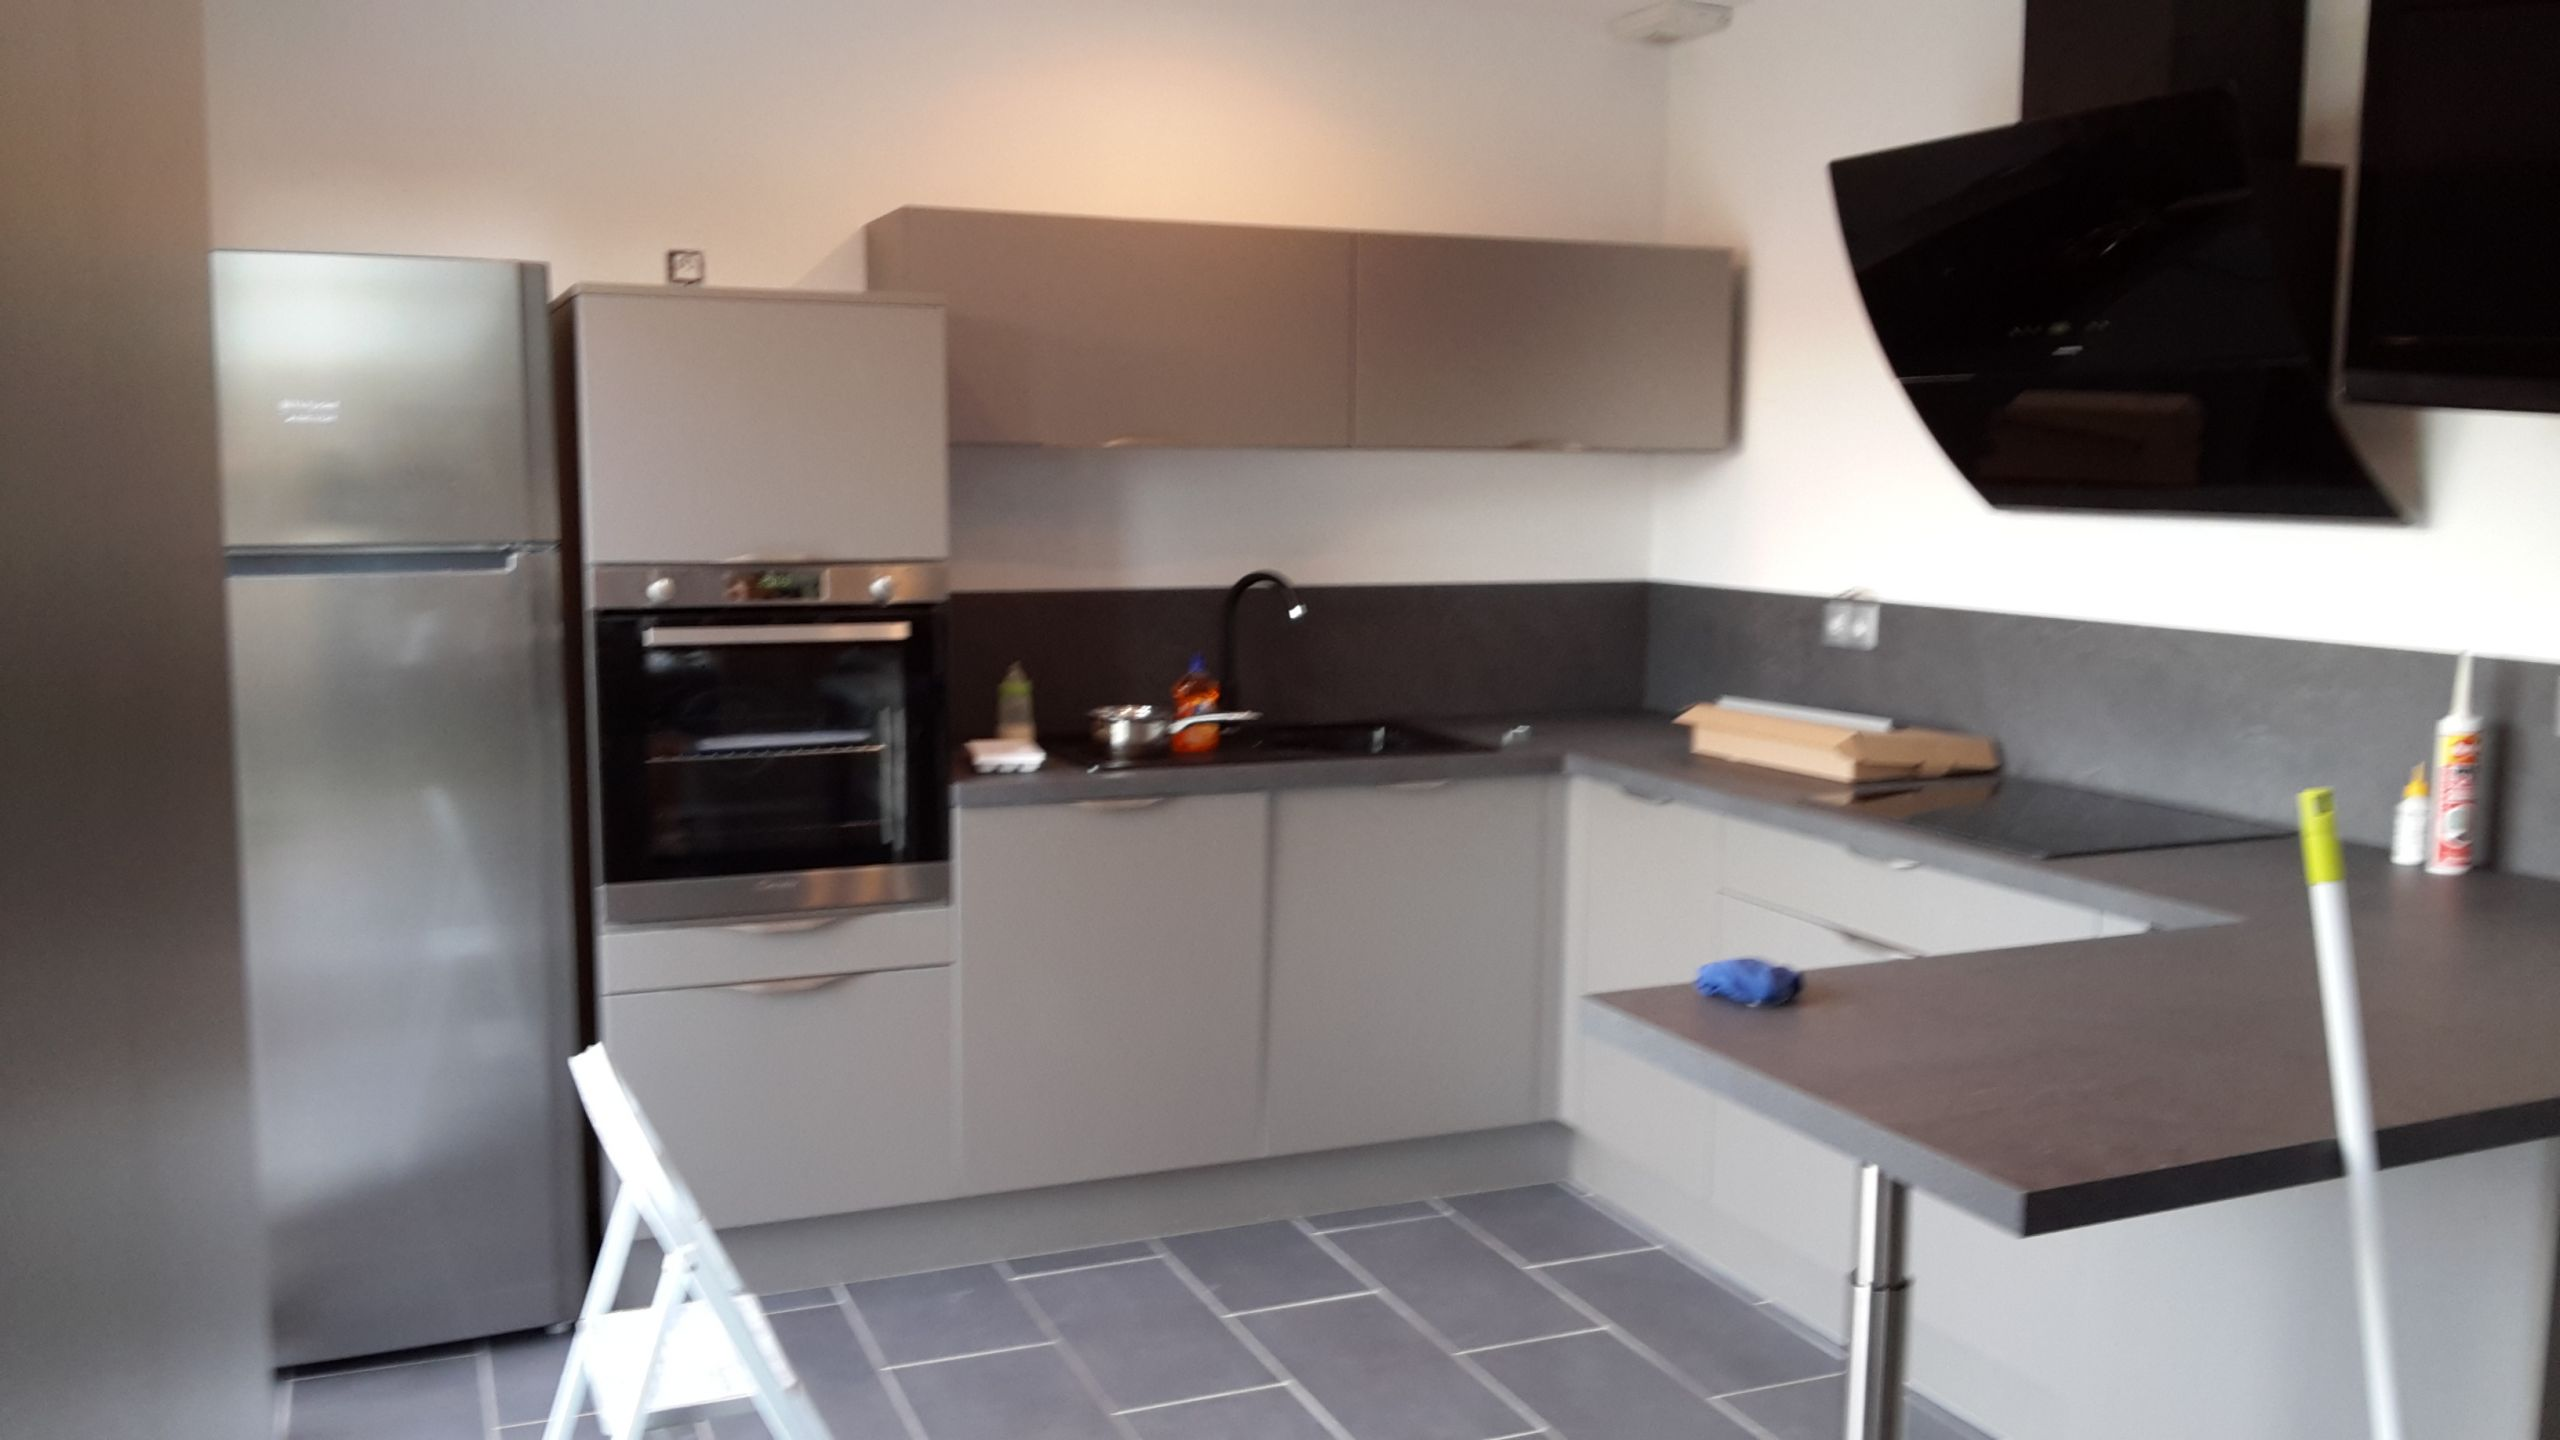 cuisine cosy brico depot beau meuble angle cuisine brico depot meuble cuisine avec hotte intc3a9grc3a9e meuble cuisine avec table intc3a9grc3a9e